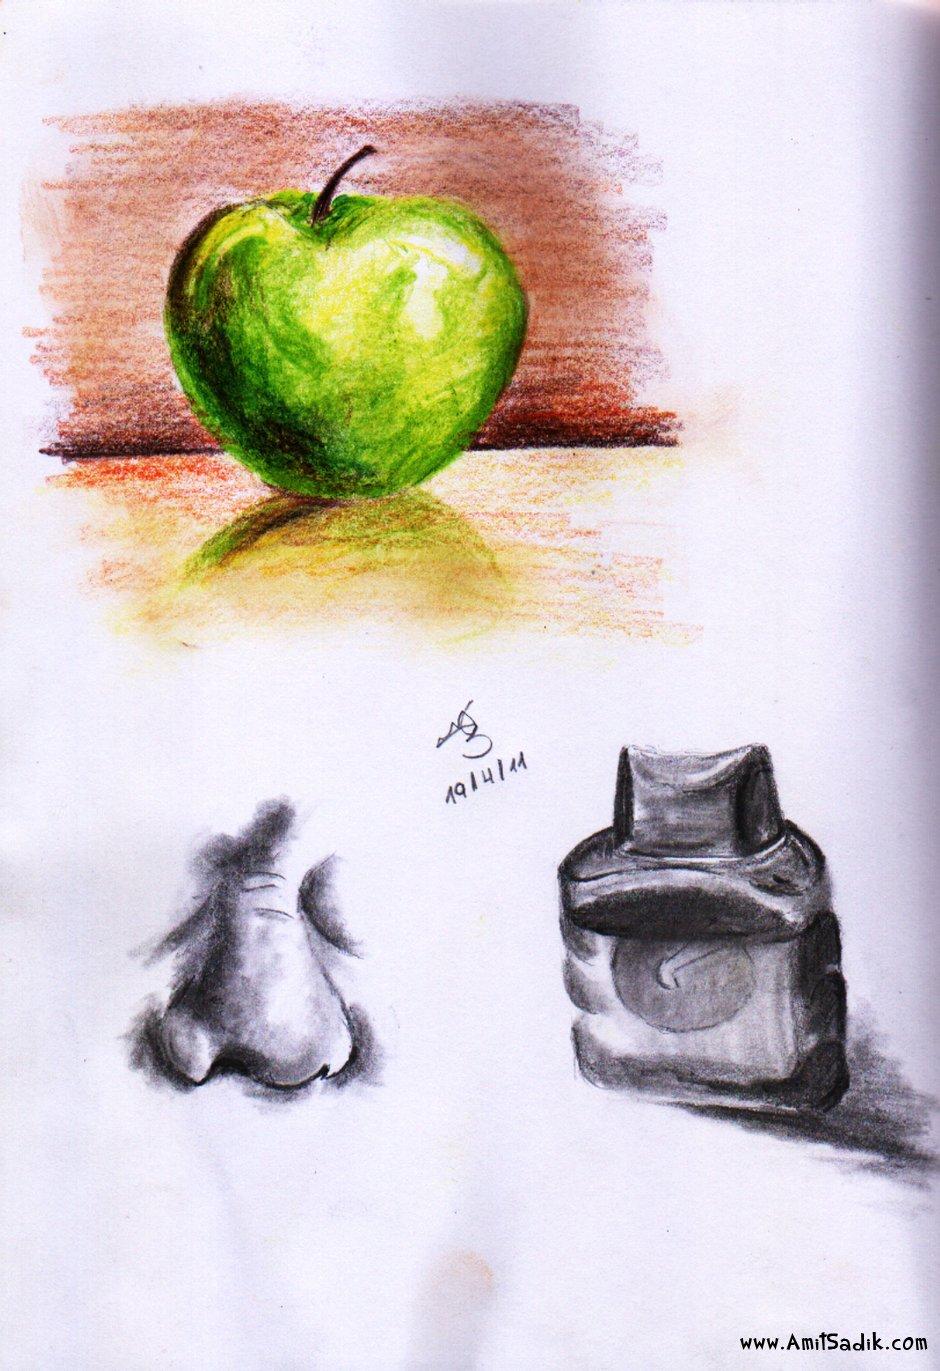 Pencil drawings - Still life